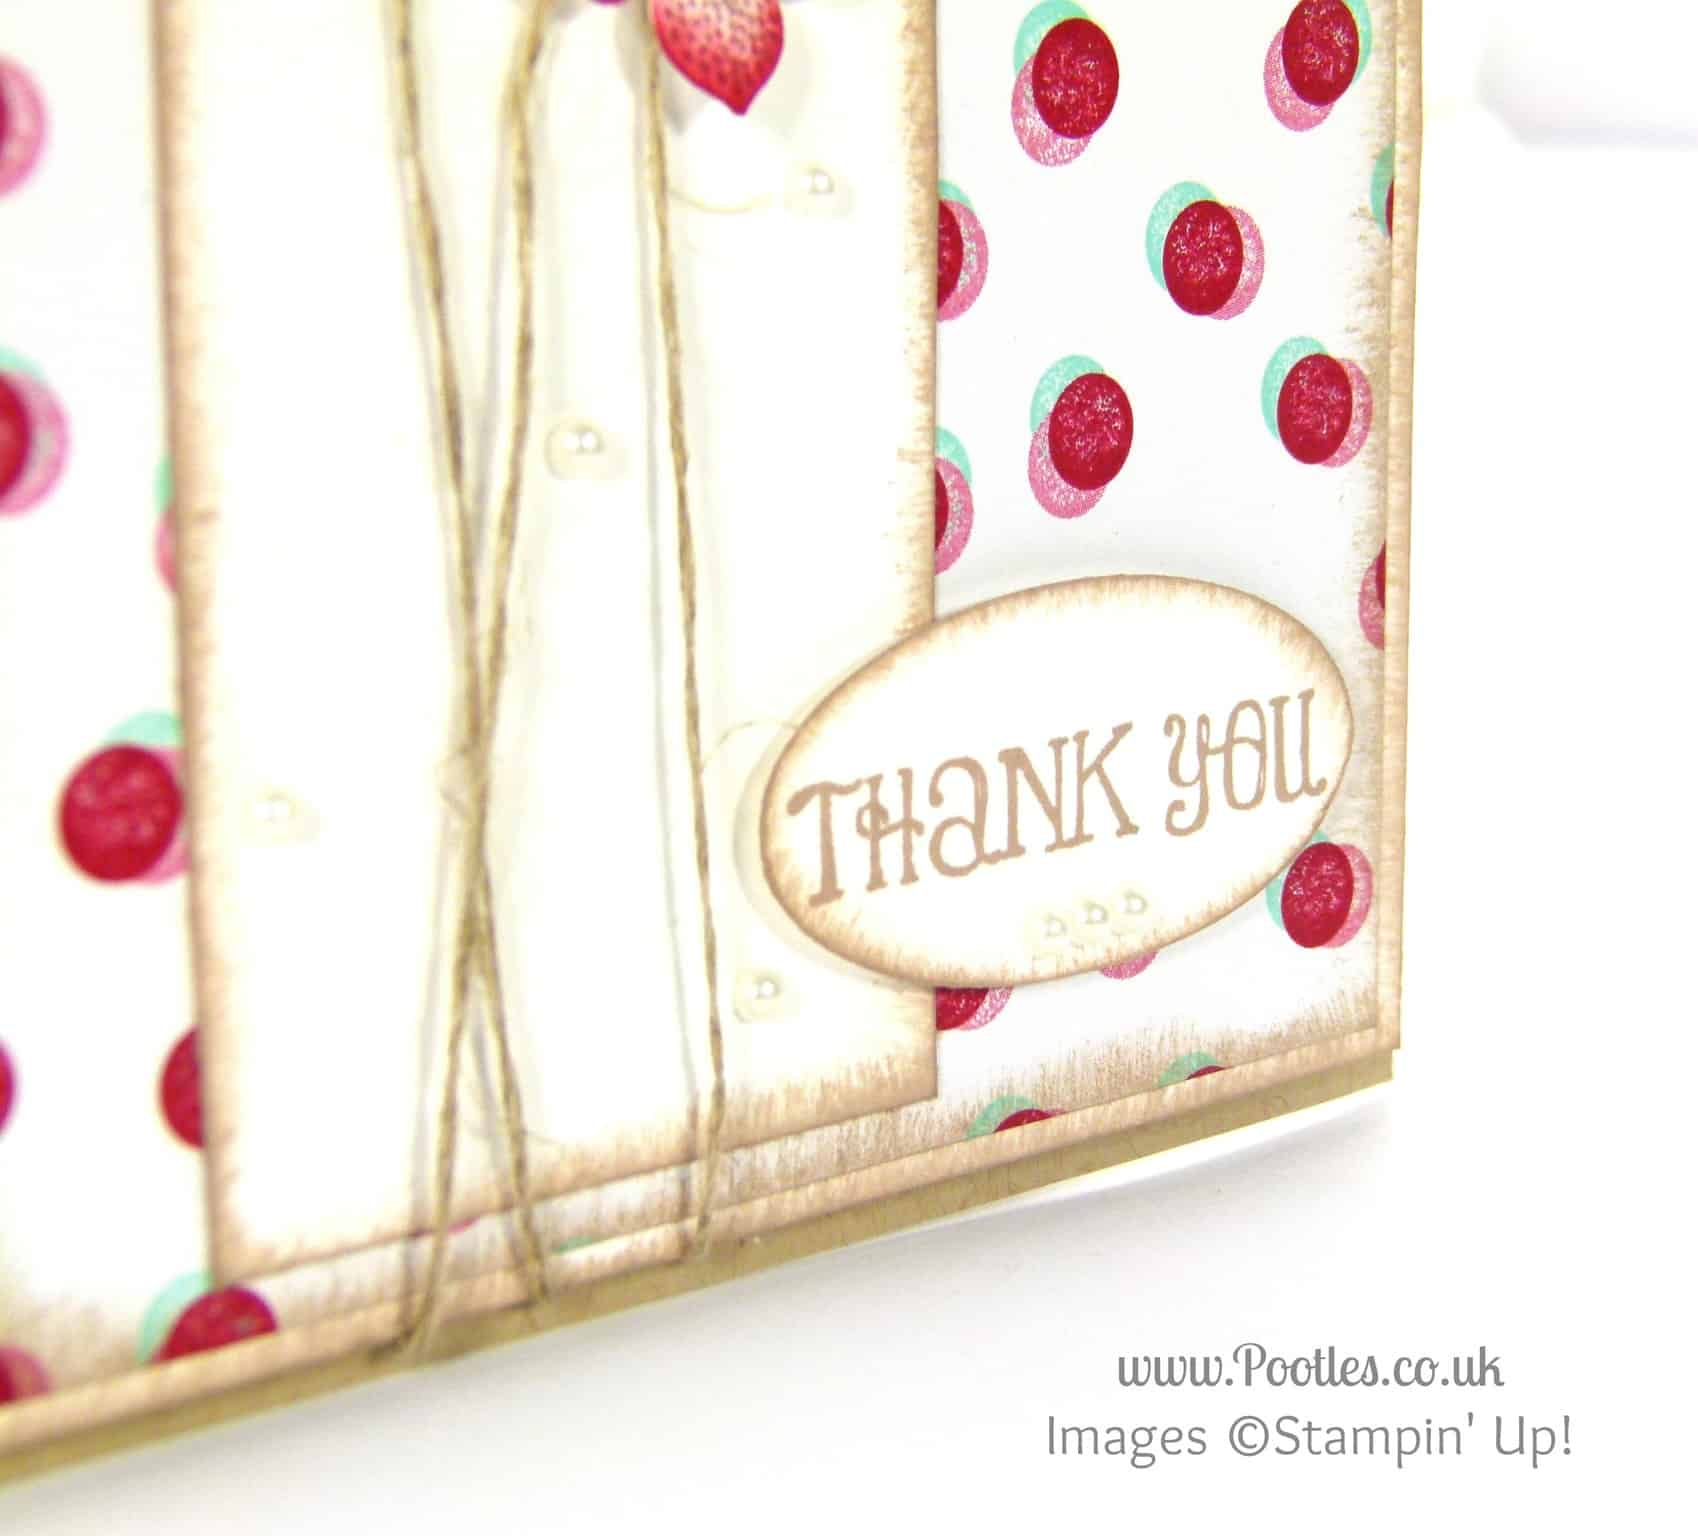 Stampin' Up! UK Demonstrator Pootles - Pretty Petite Fresh Prints Floral Card Lots of Thanks Stamp Detail